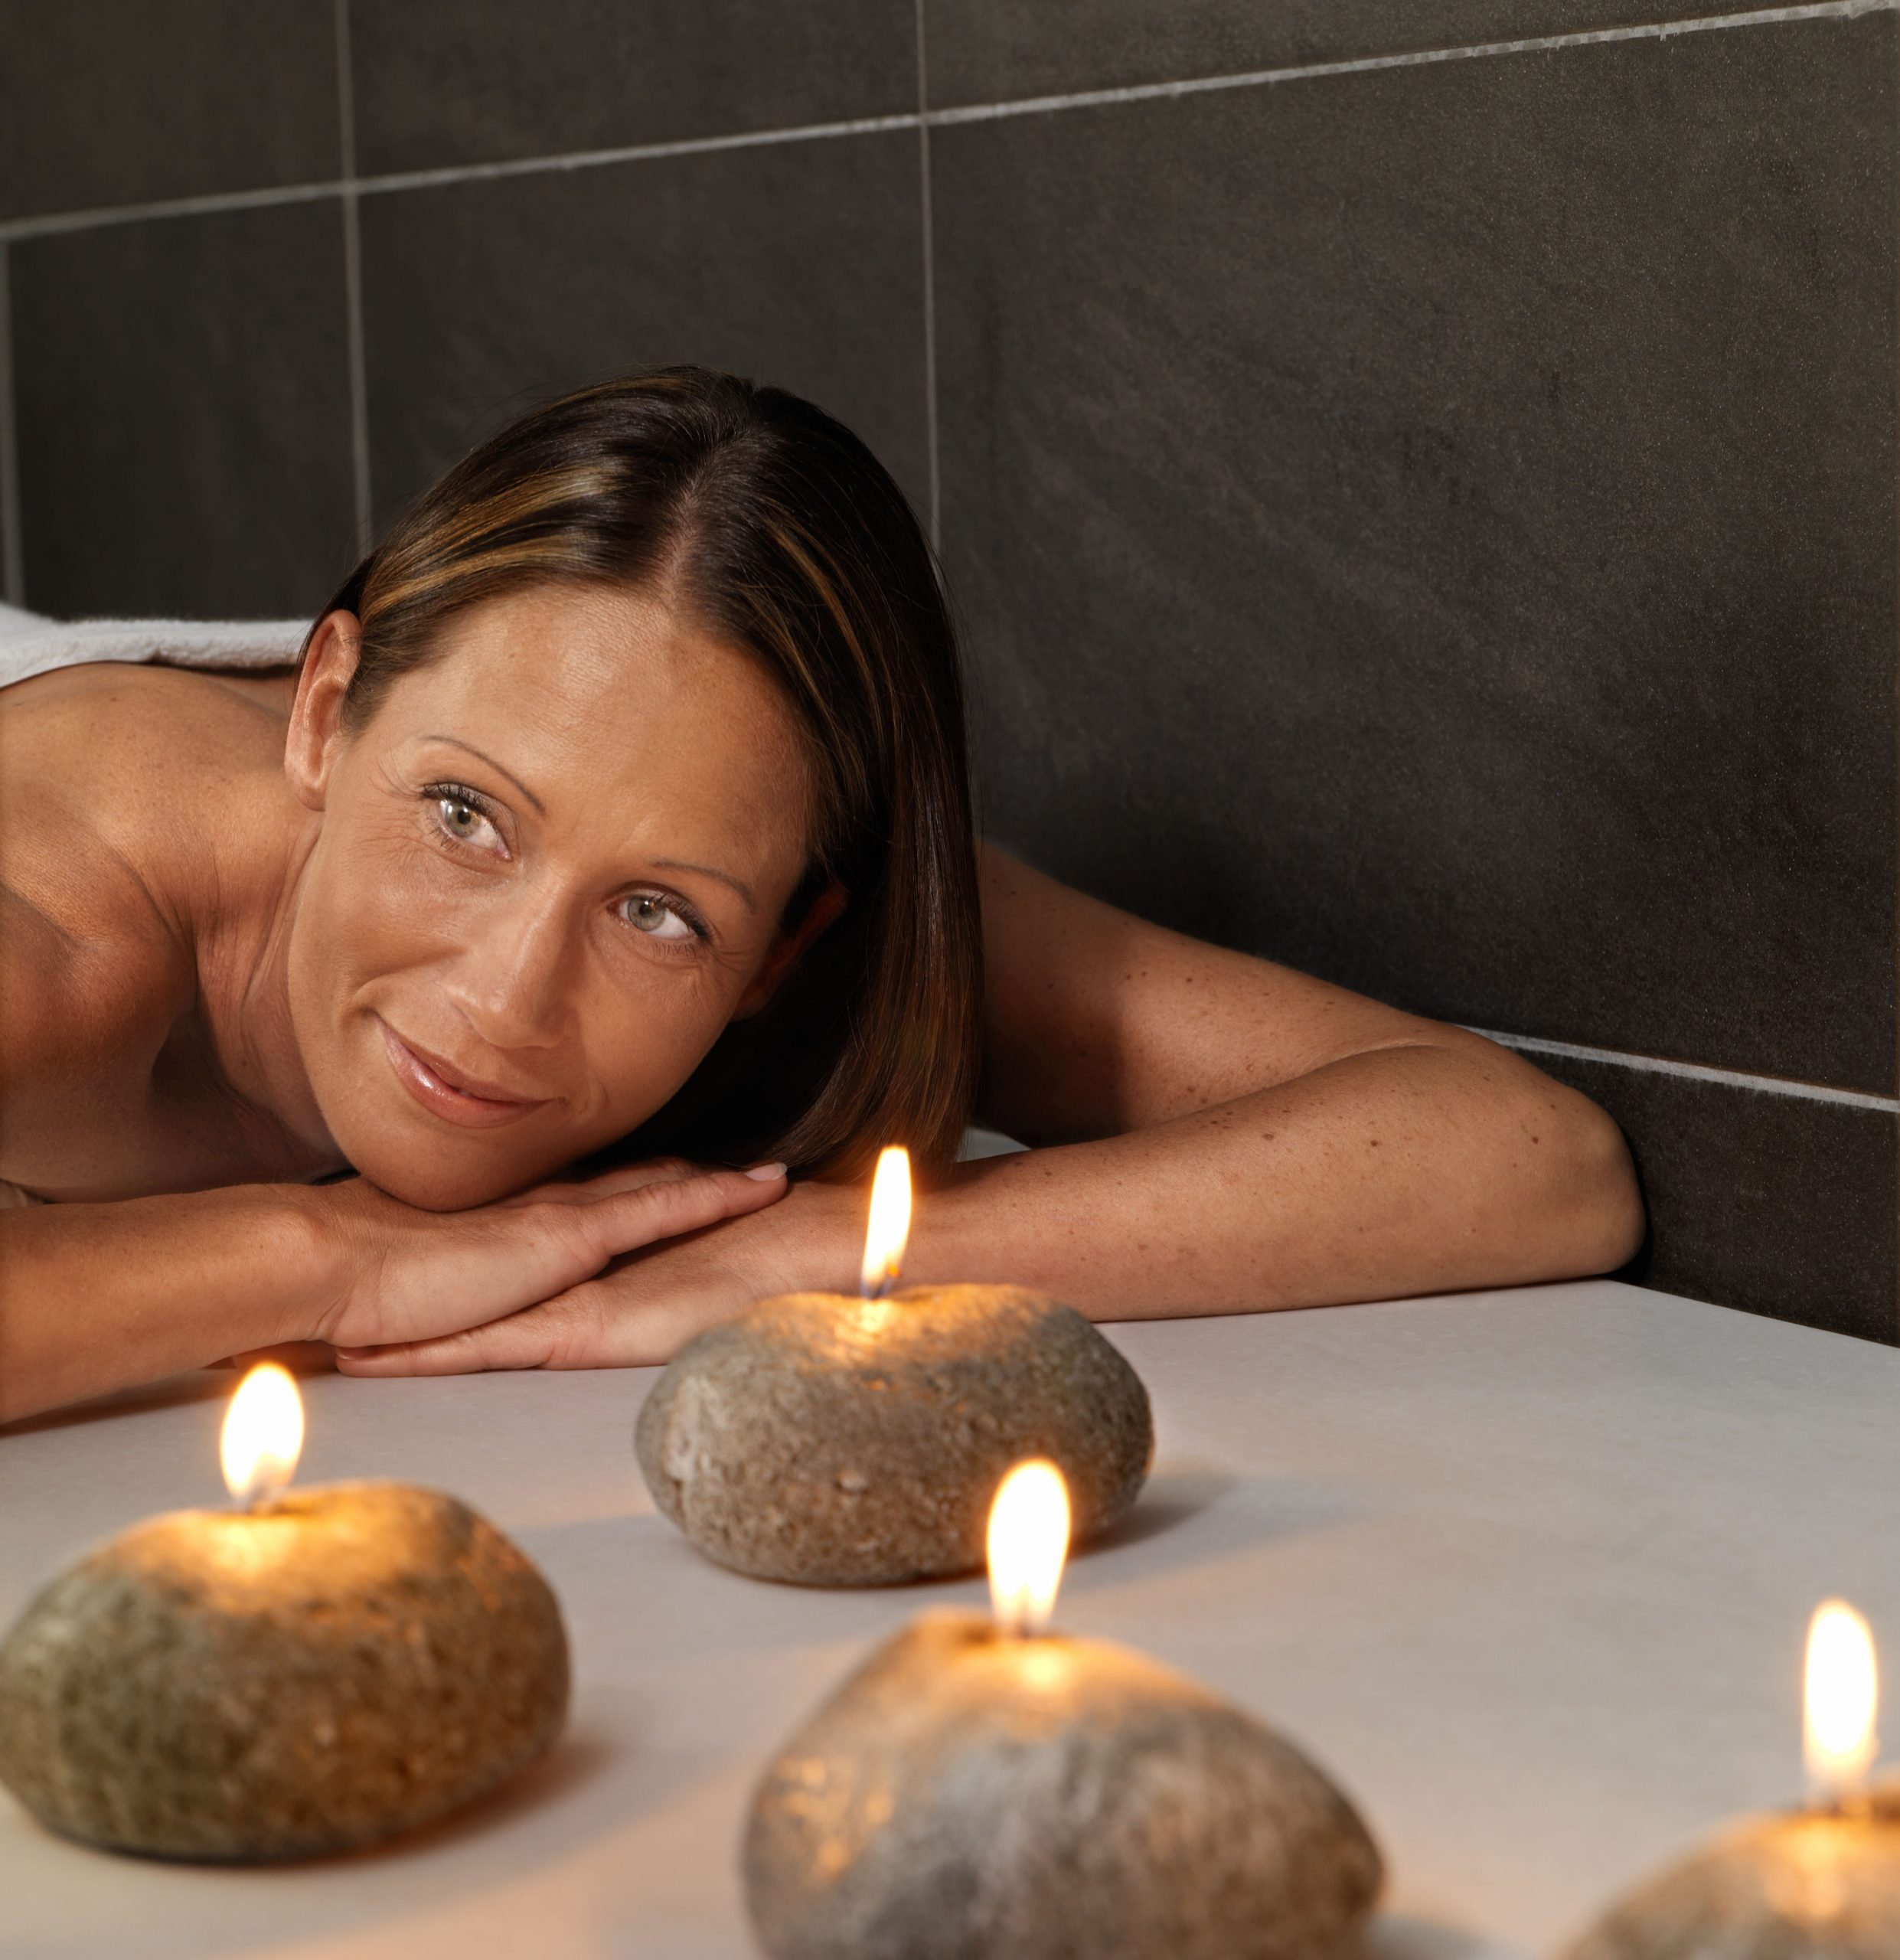 Use a Sauna to Boost Wellness